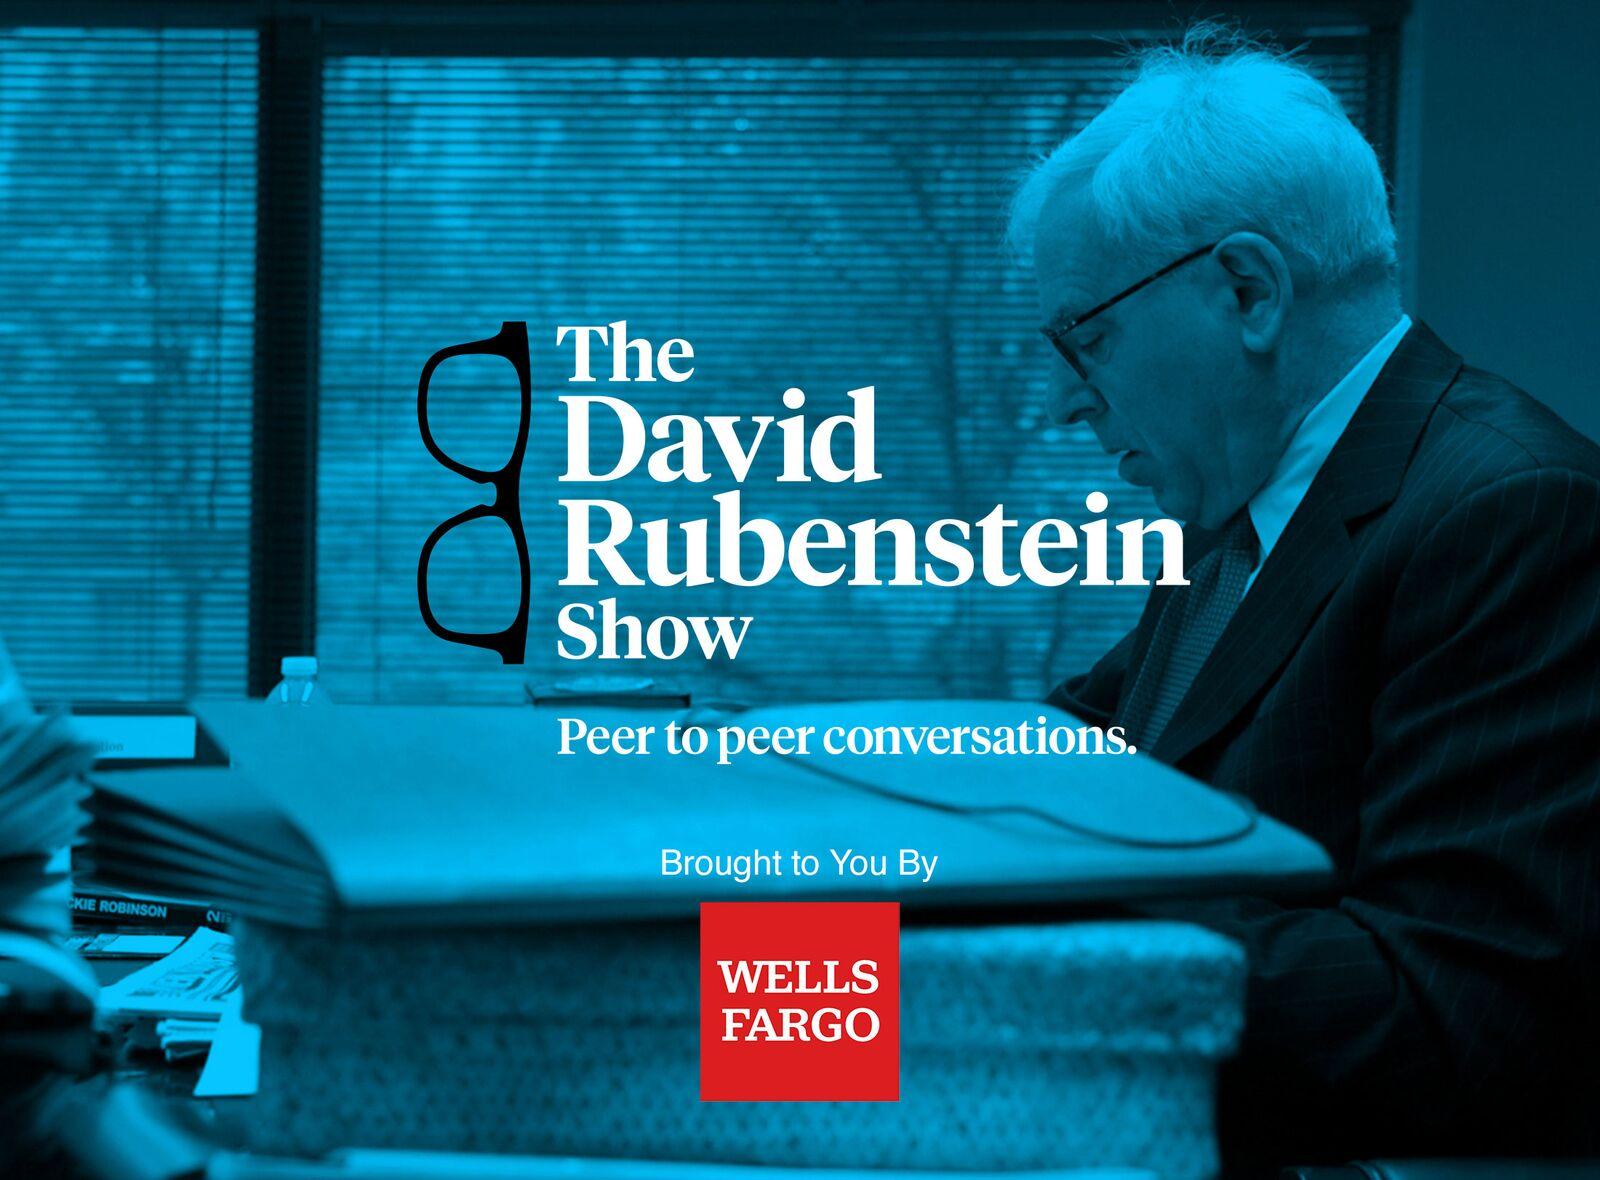 The David Rubenstein Show: Peer-to-Peer Conversations